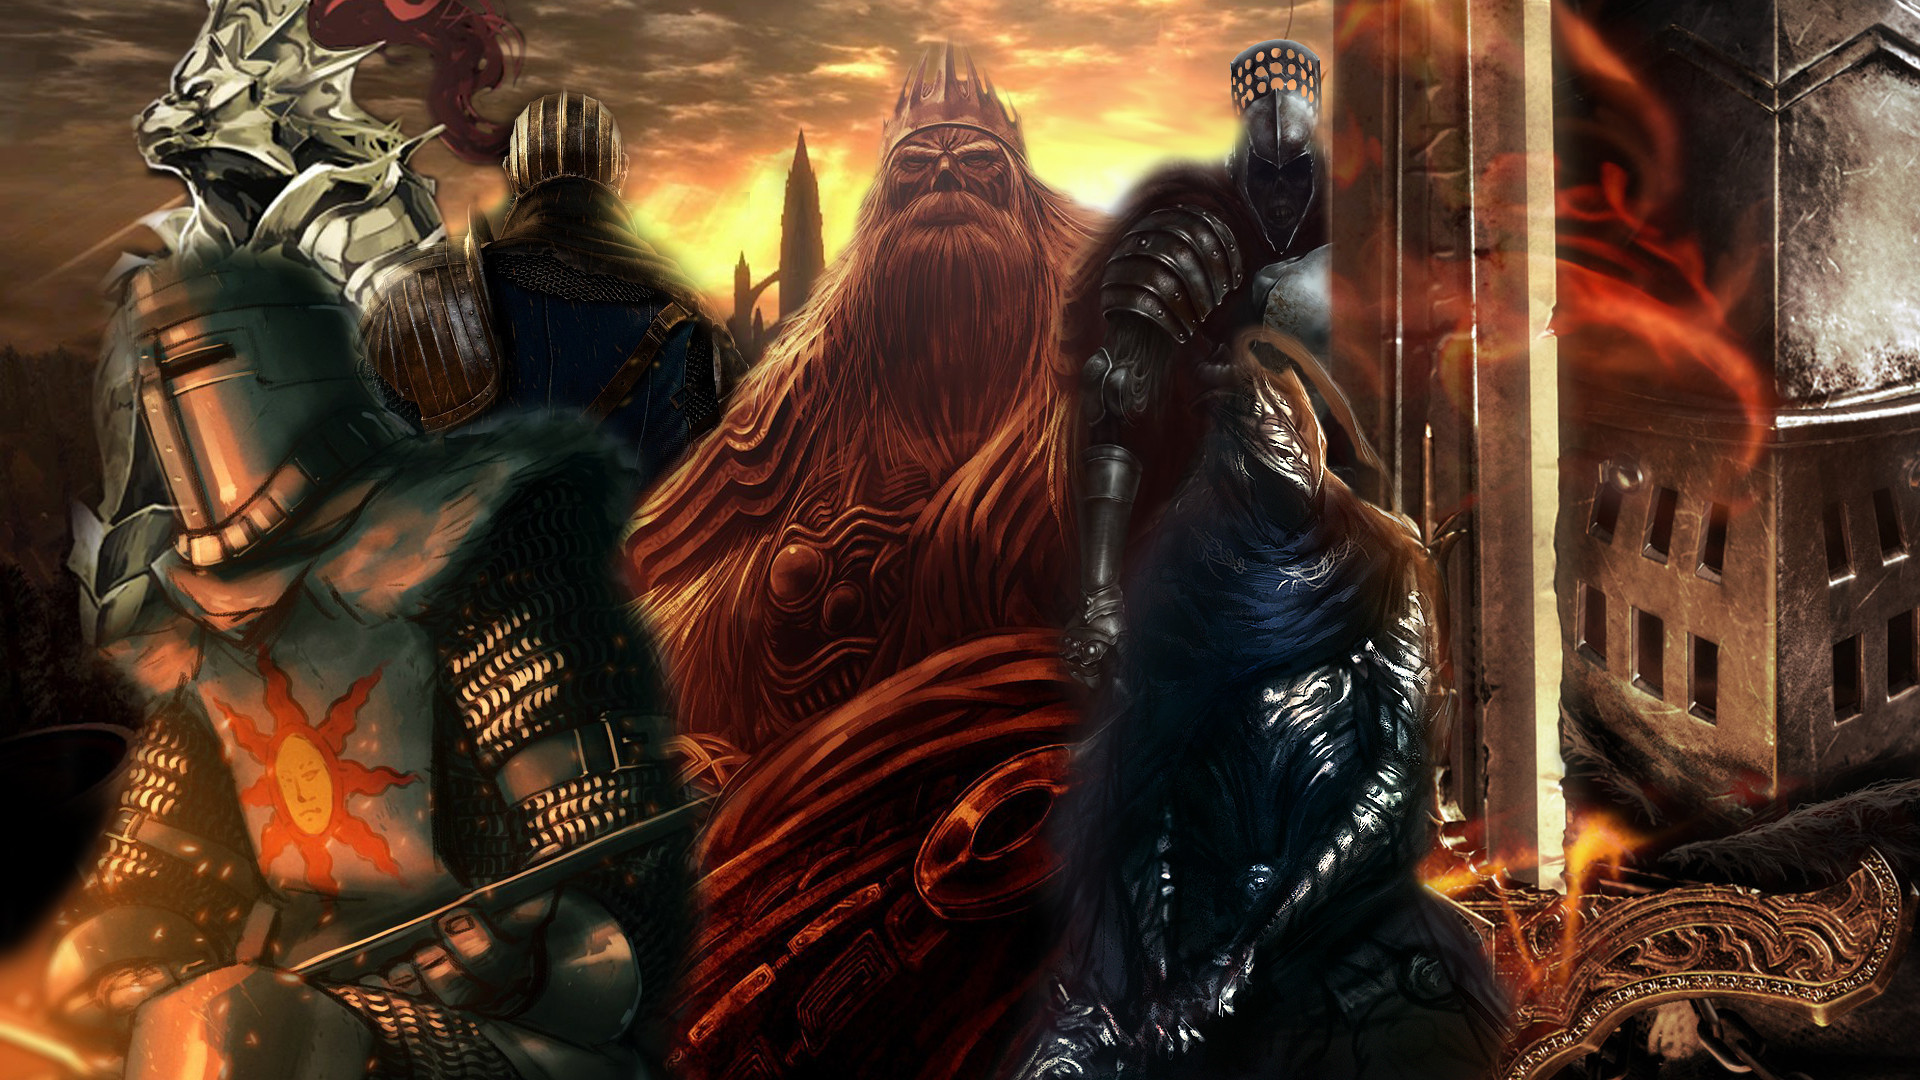 Dark Souls Background 1920x1080: Dark Souls 3 Live Wallpaper (81+ Images